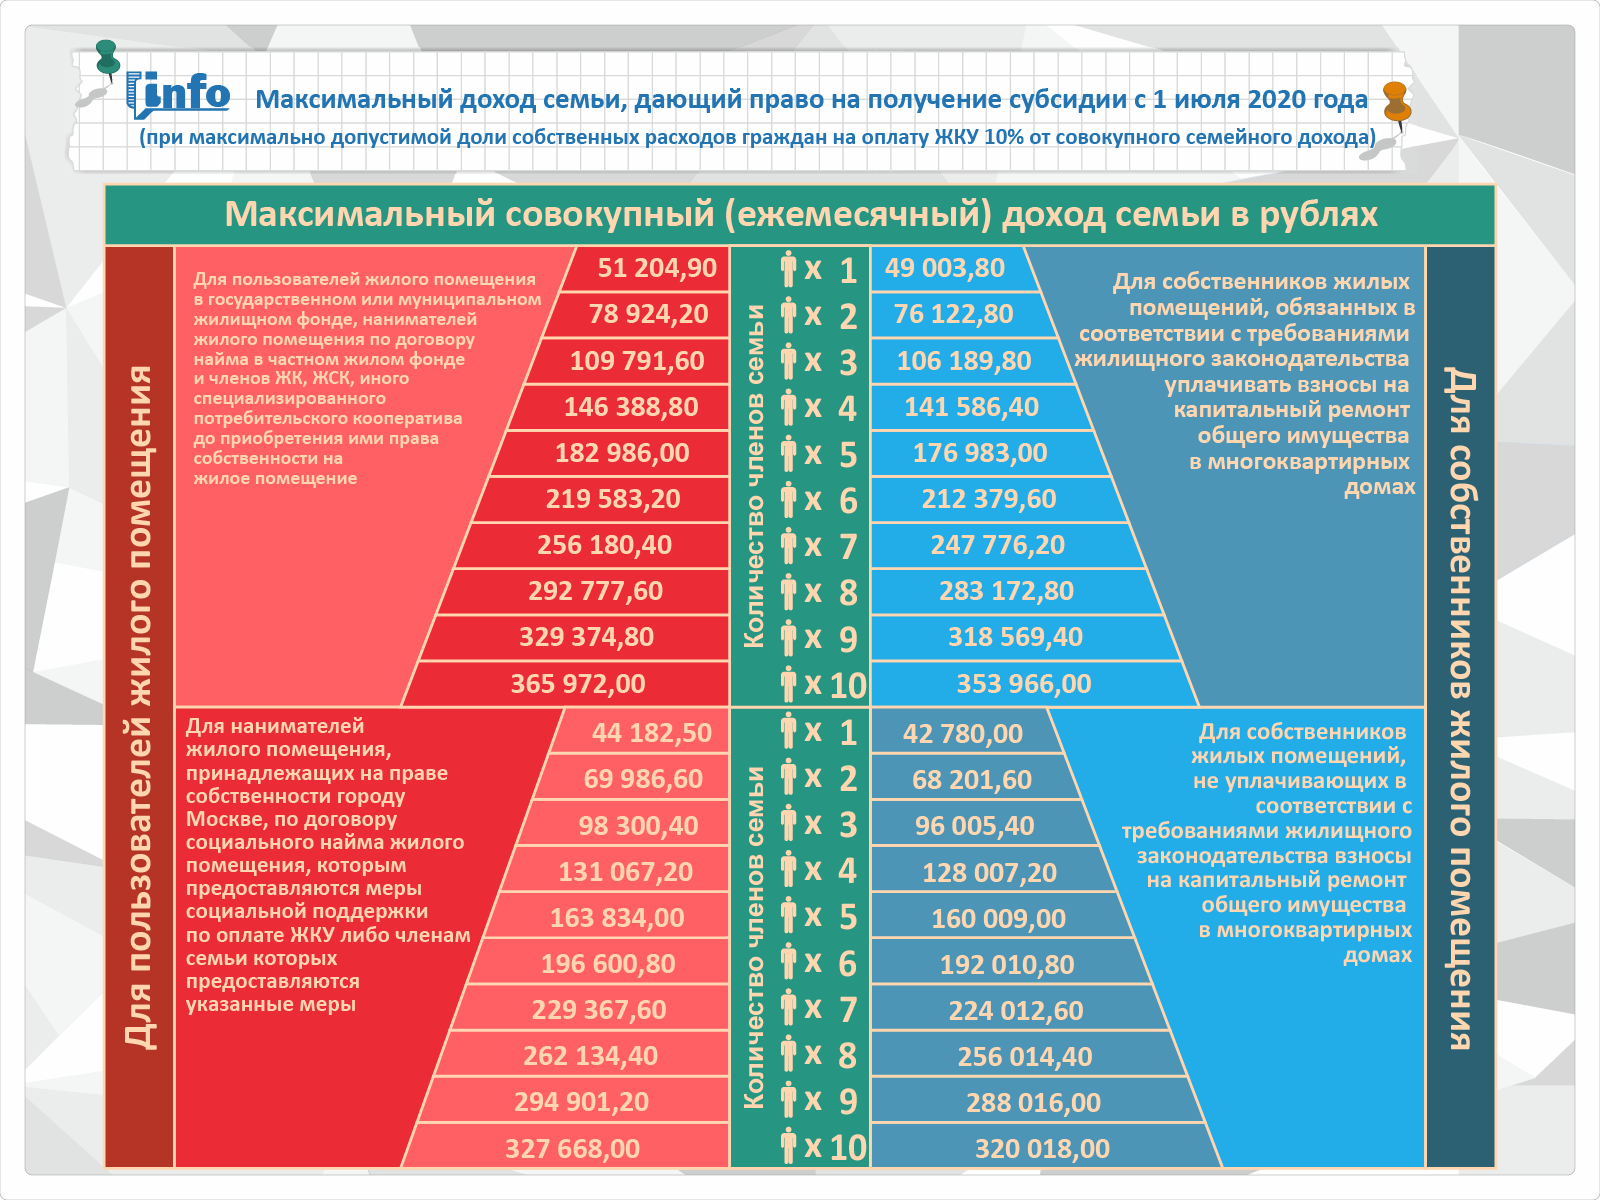 Субсидия на оплату ЖКХ в 2021 году